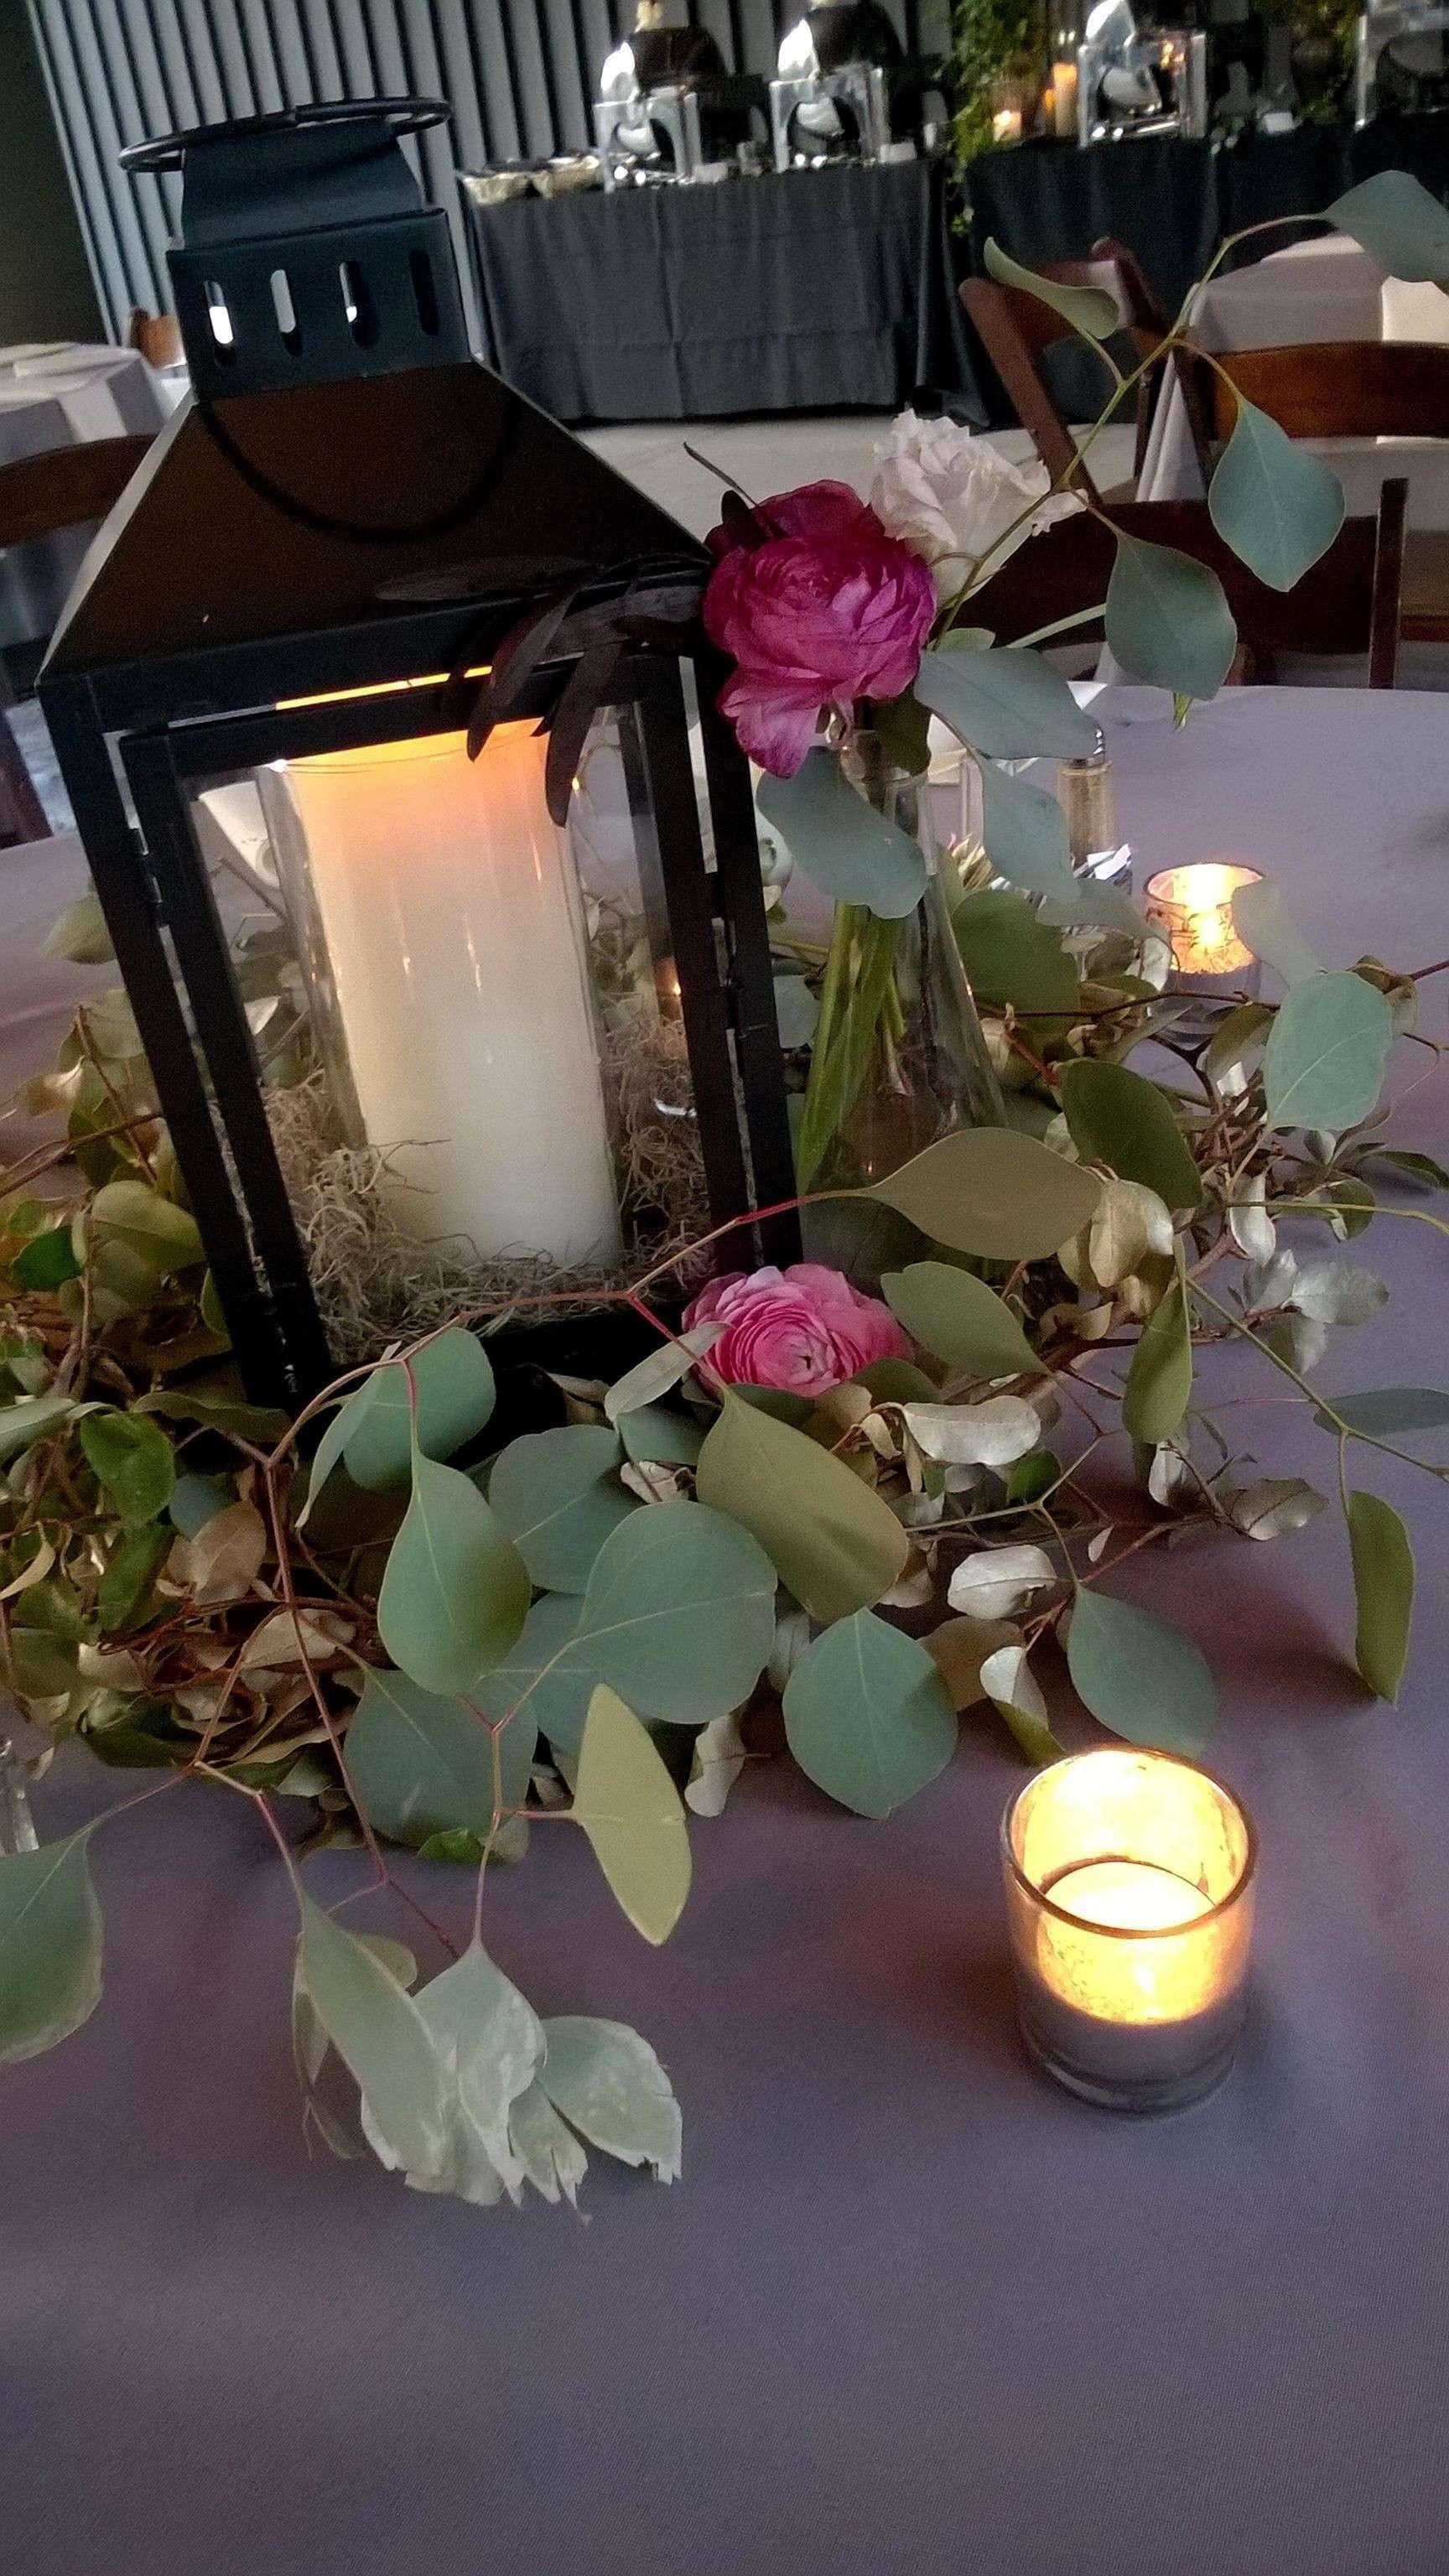 Japanese Ikebana Vases Of 19 Best Of Flower Arrangements On A Budget Flower Decoration Ideas Intended for Easy Wedding Decorations New I Pinimg originals 0d 55 Ee Design